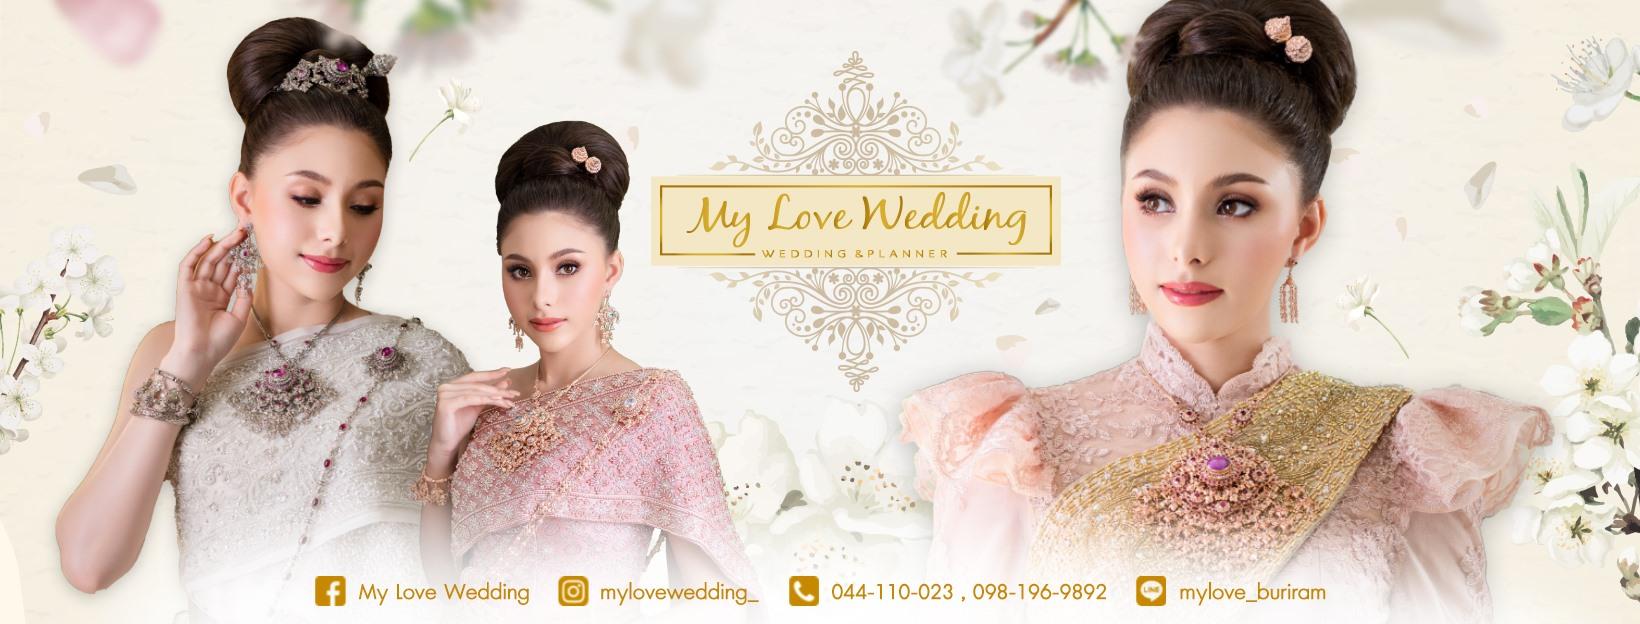 My Love Wedding บุรีรัมย์